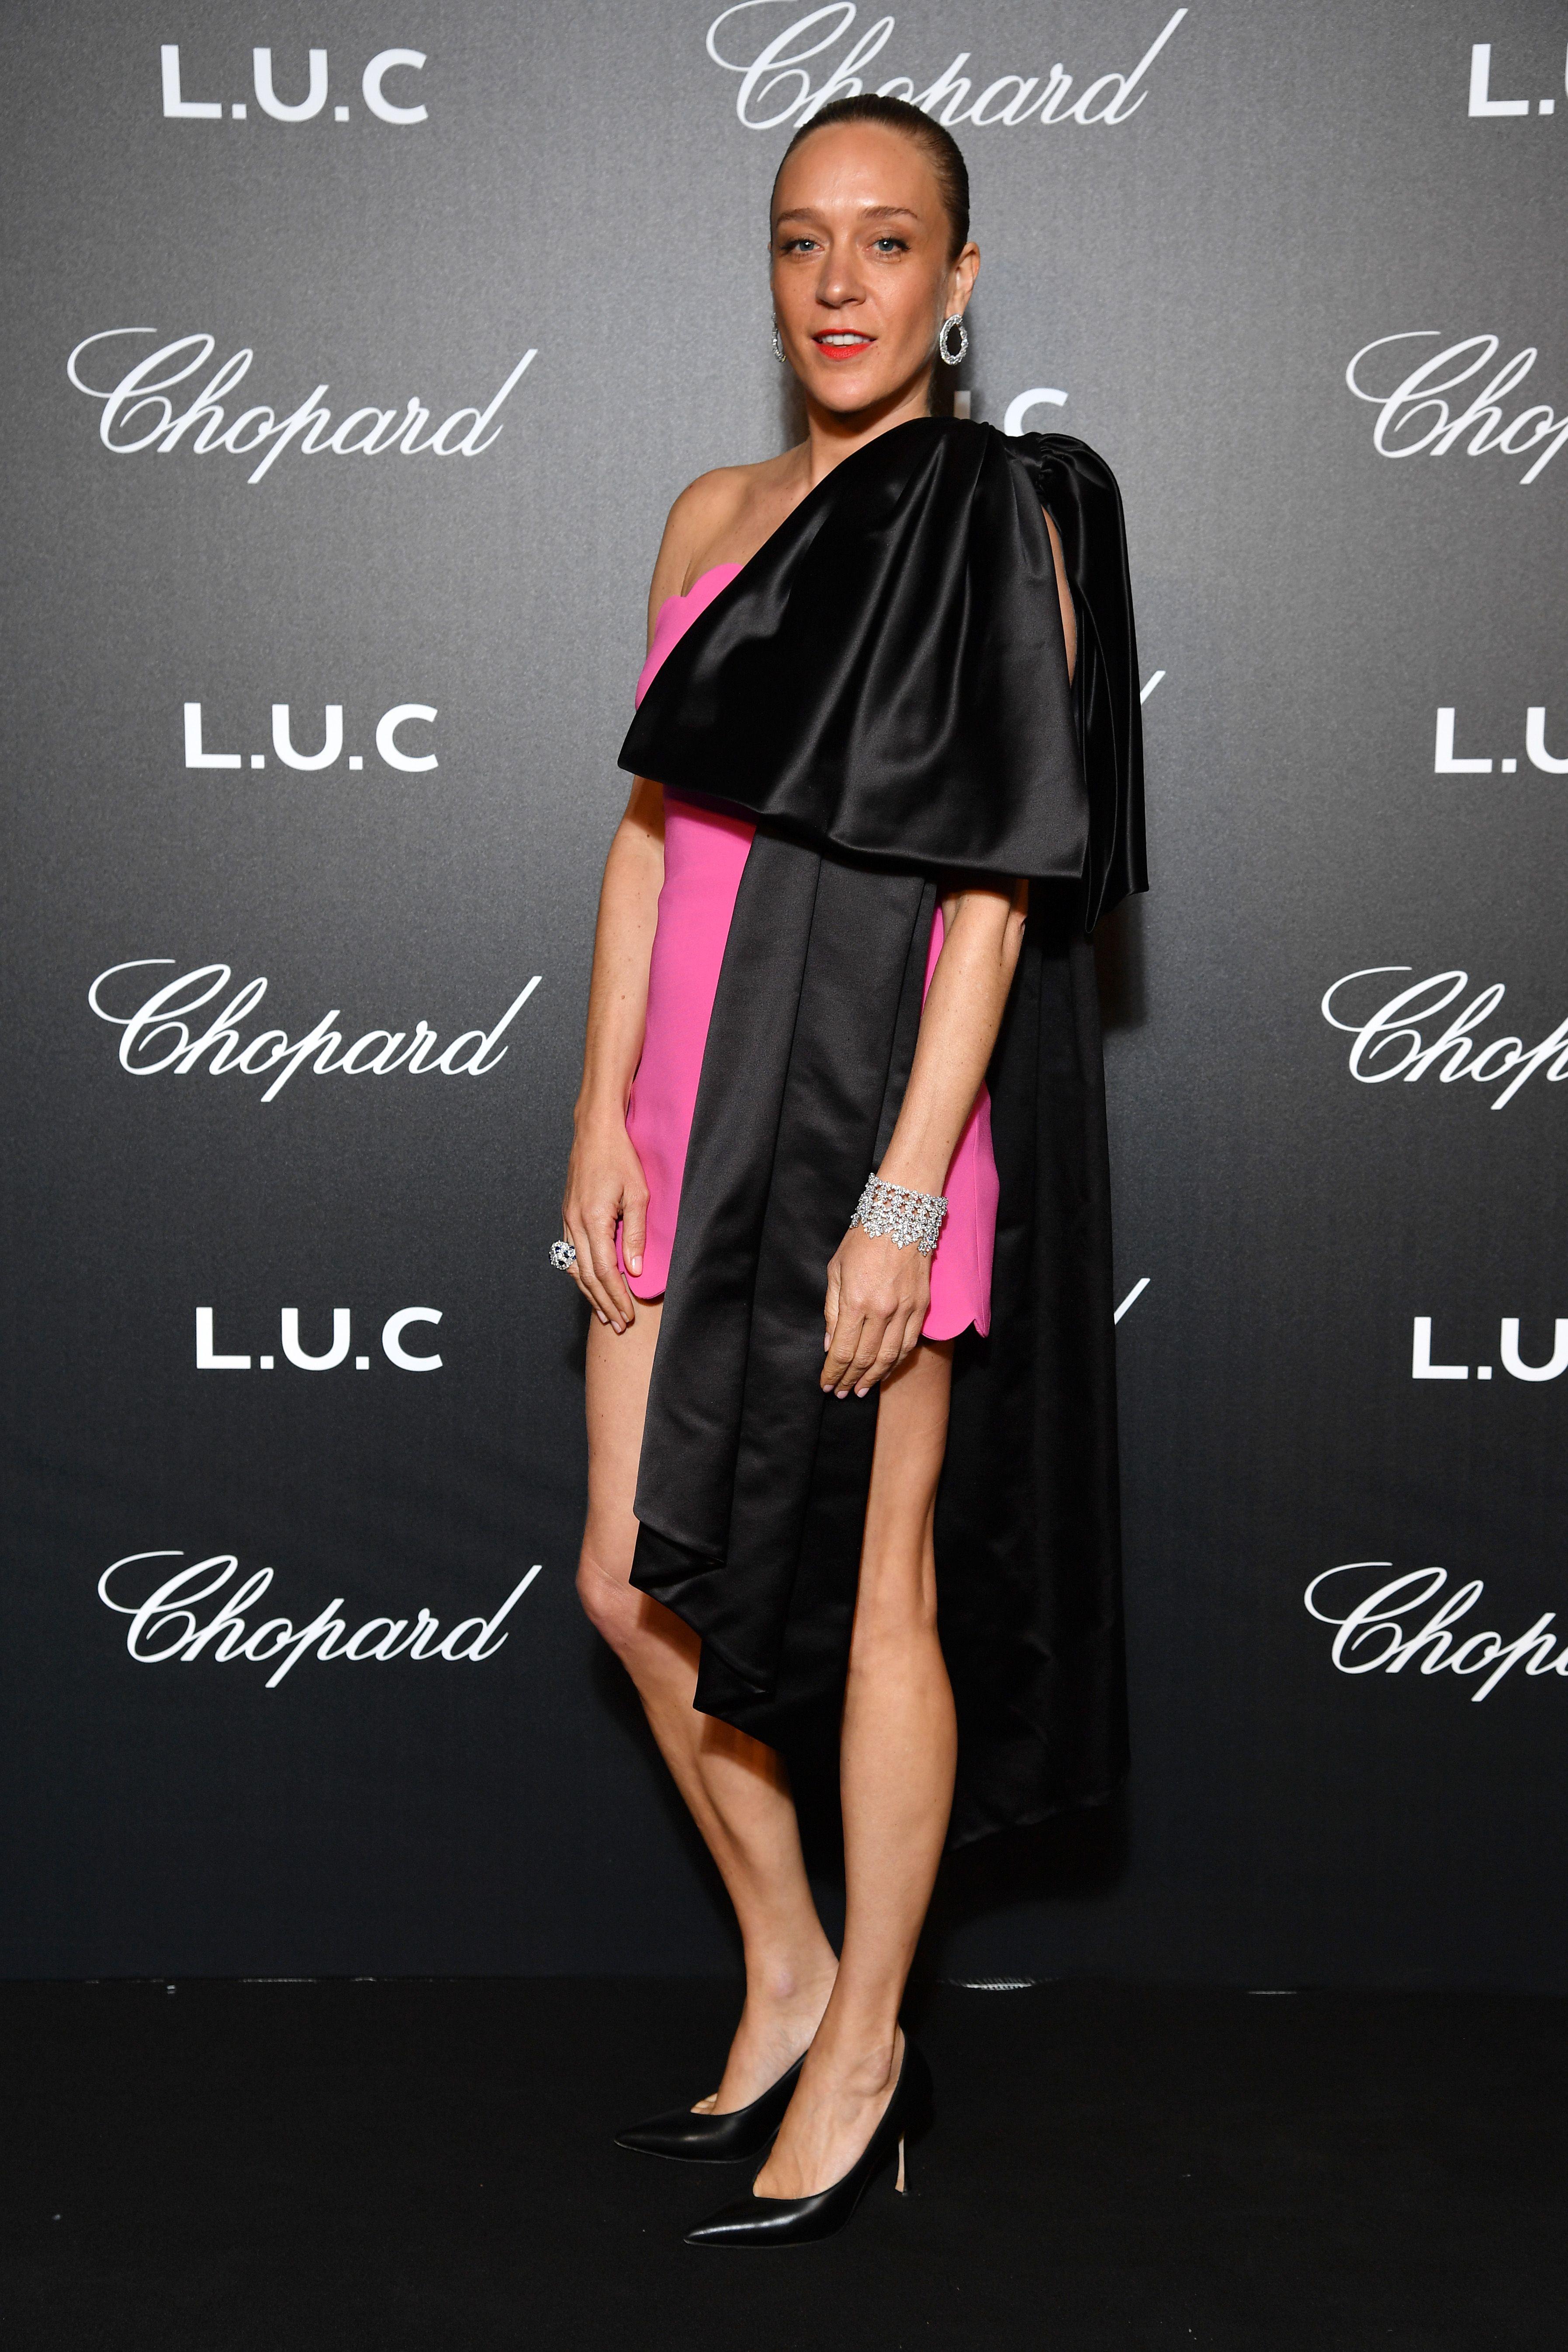 Chloe Sevigny's Best Fashion Moments